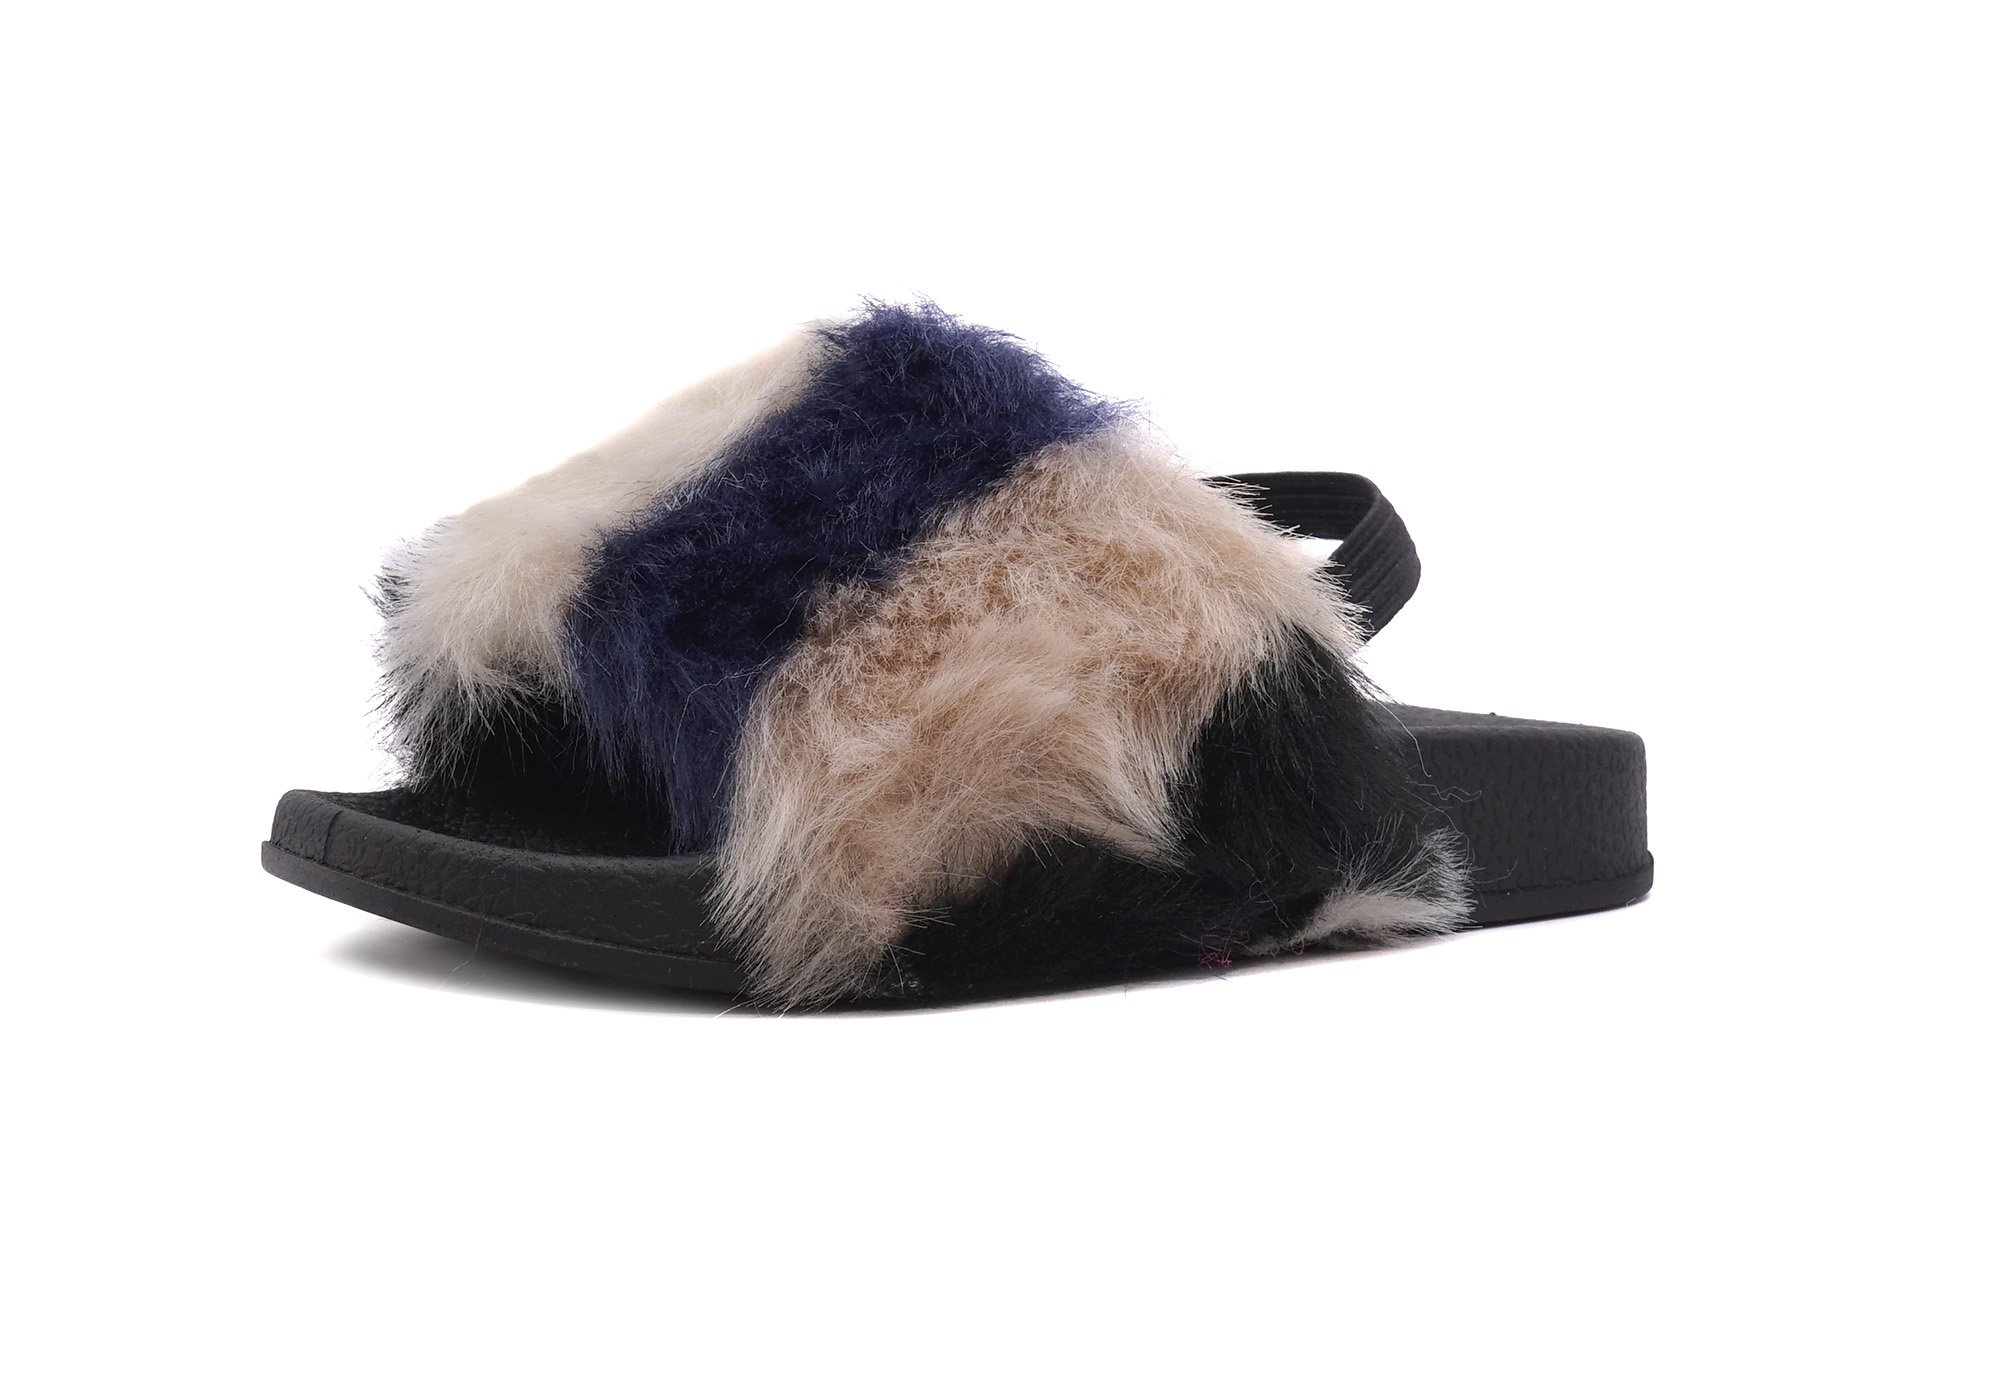 Simply Petals Kids' Fur Slip On Slide Sandal Slippers (7 M US Toddler, Tan)